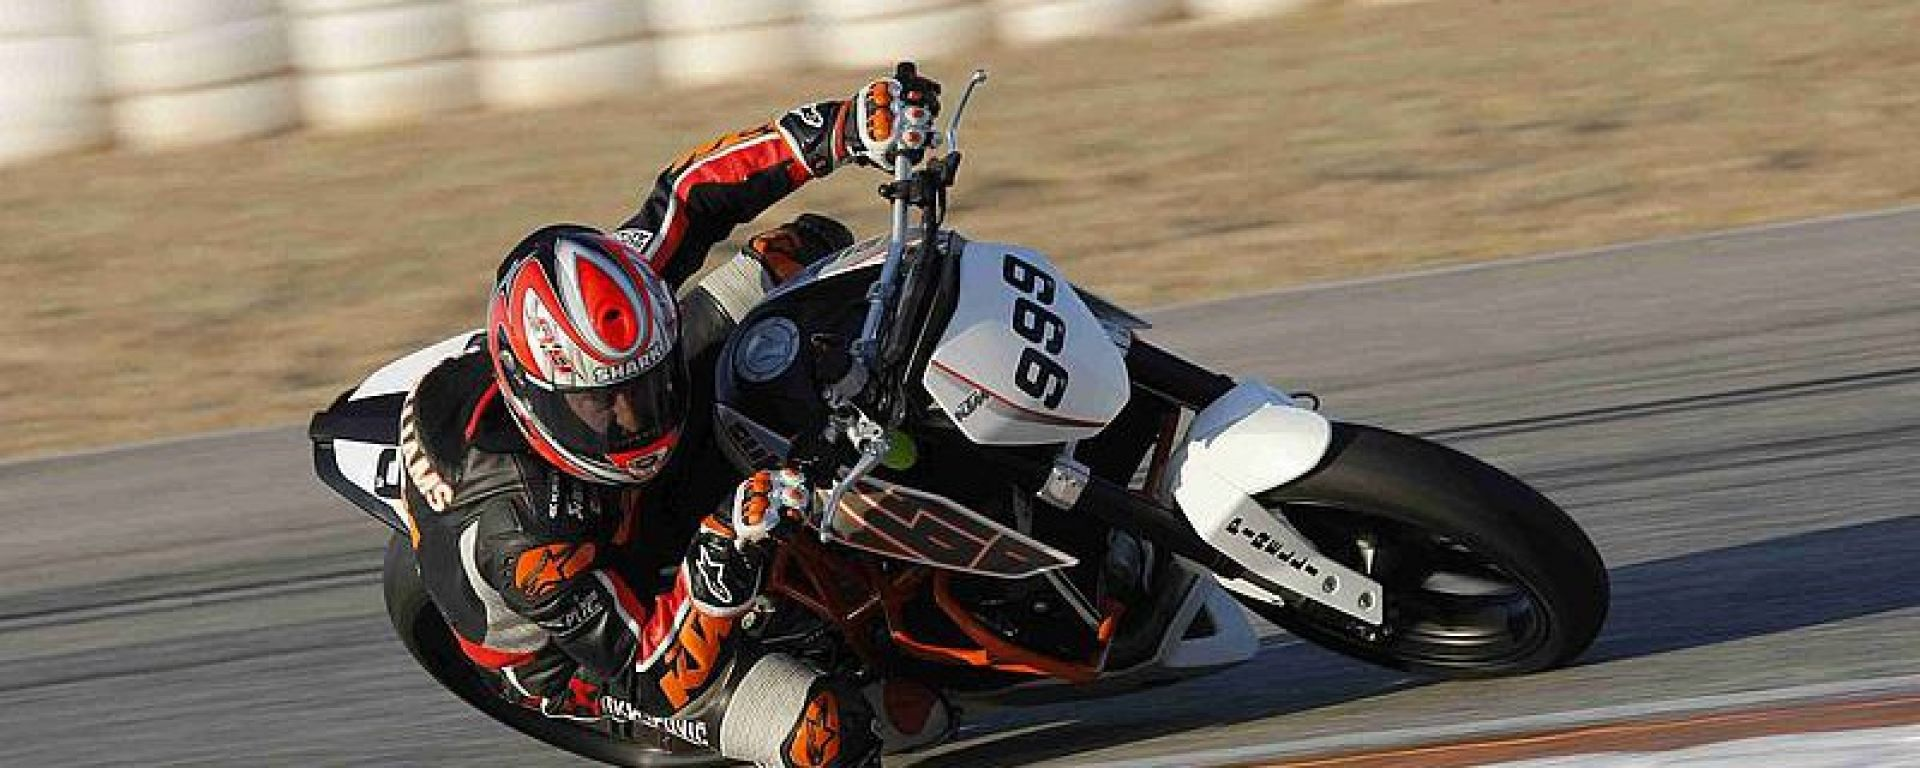 KTM: la 690 Duke Trofeo in pista a Cartagena